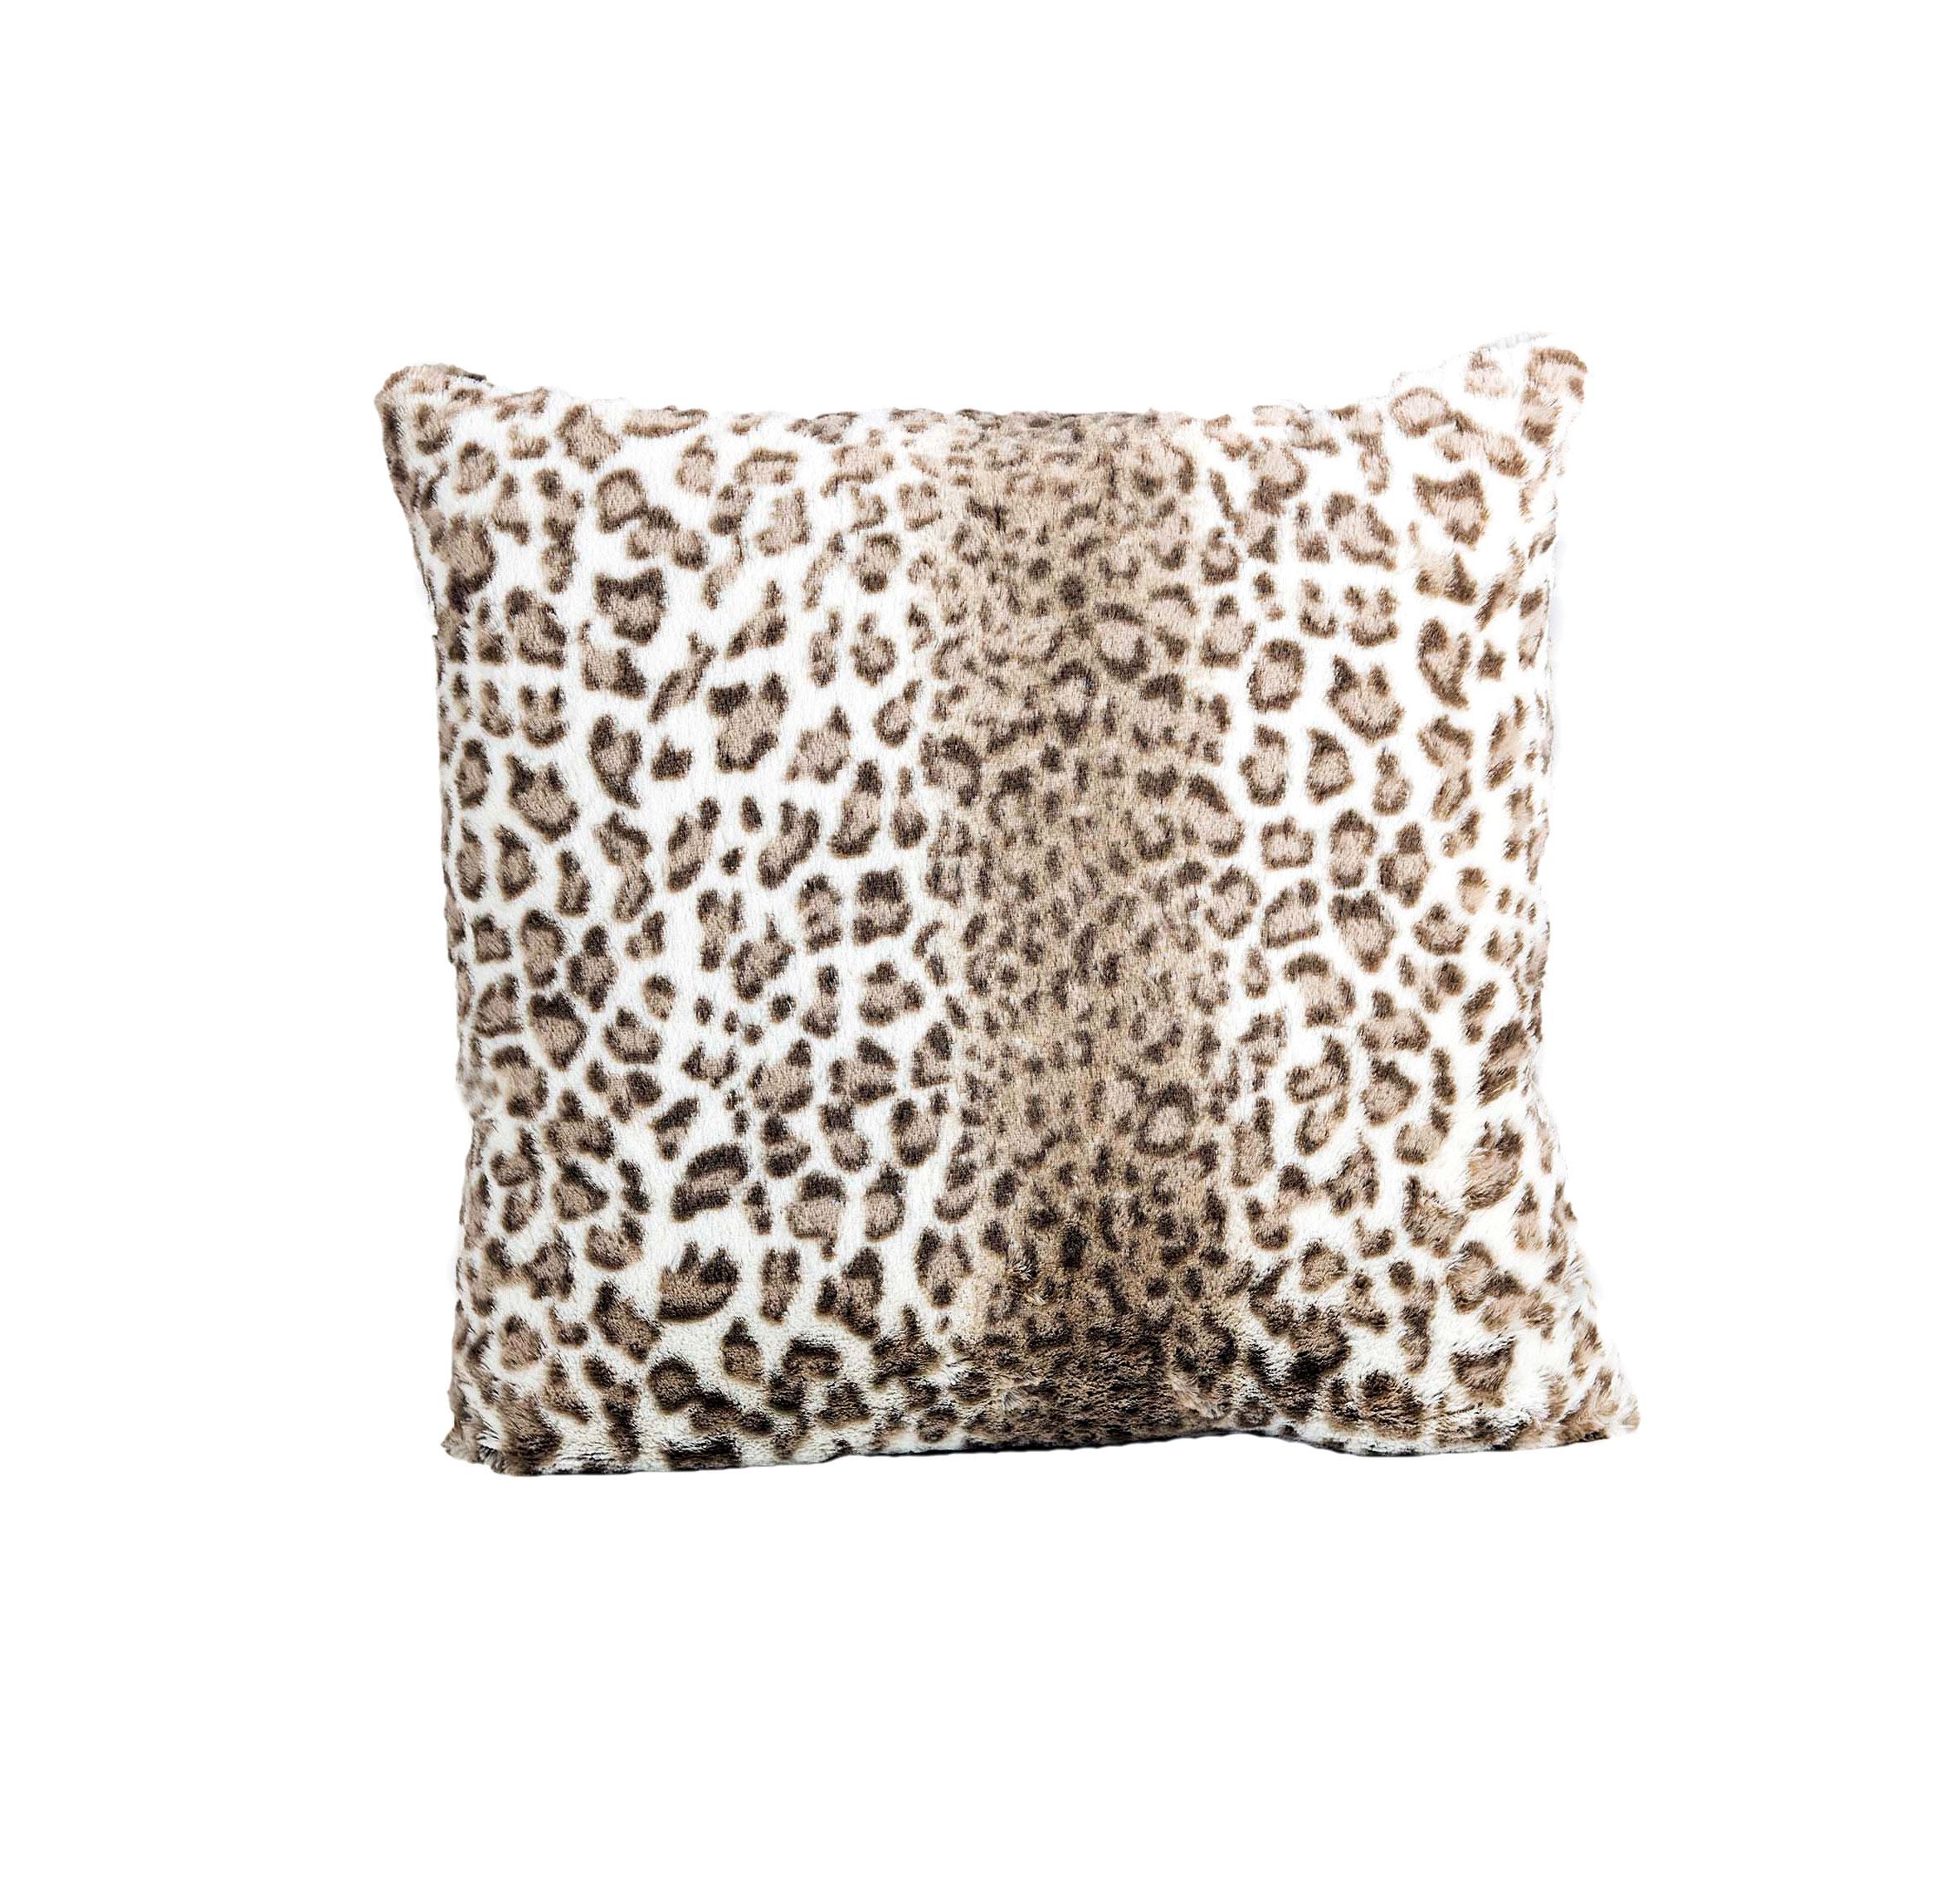 dekokissen lana leopard 50x50 cm natural ohne f llkissen. Black Bedroom Furniture Sets. Home Design Ideas